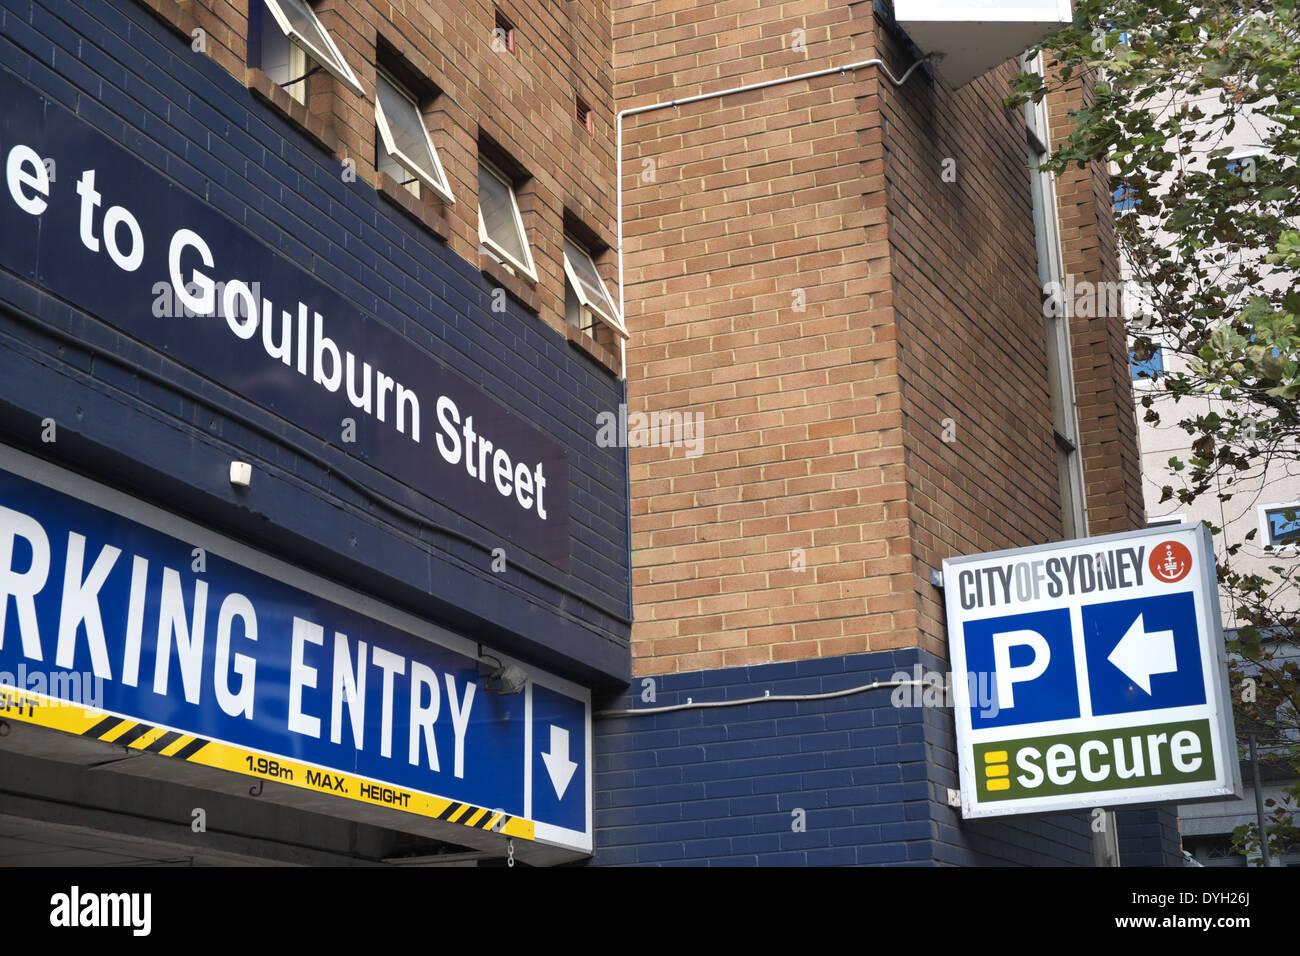 Goulburn Street Car Park